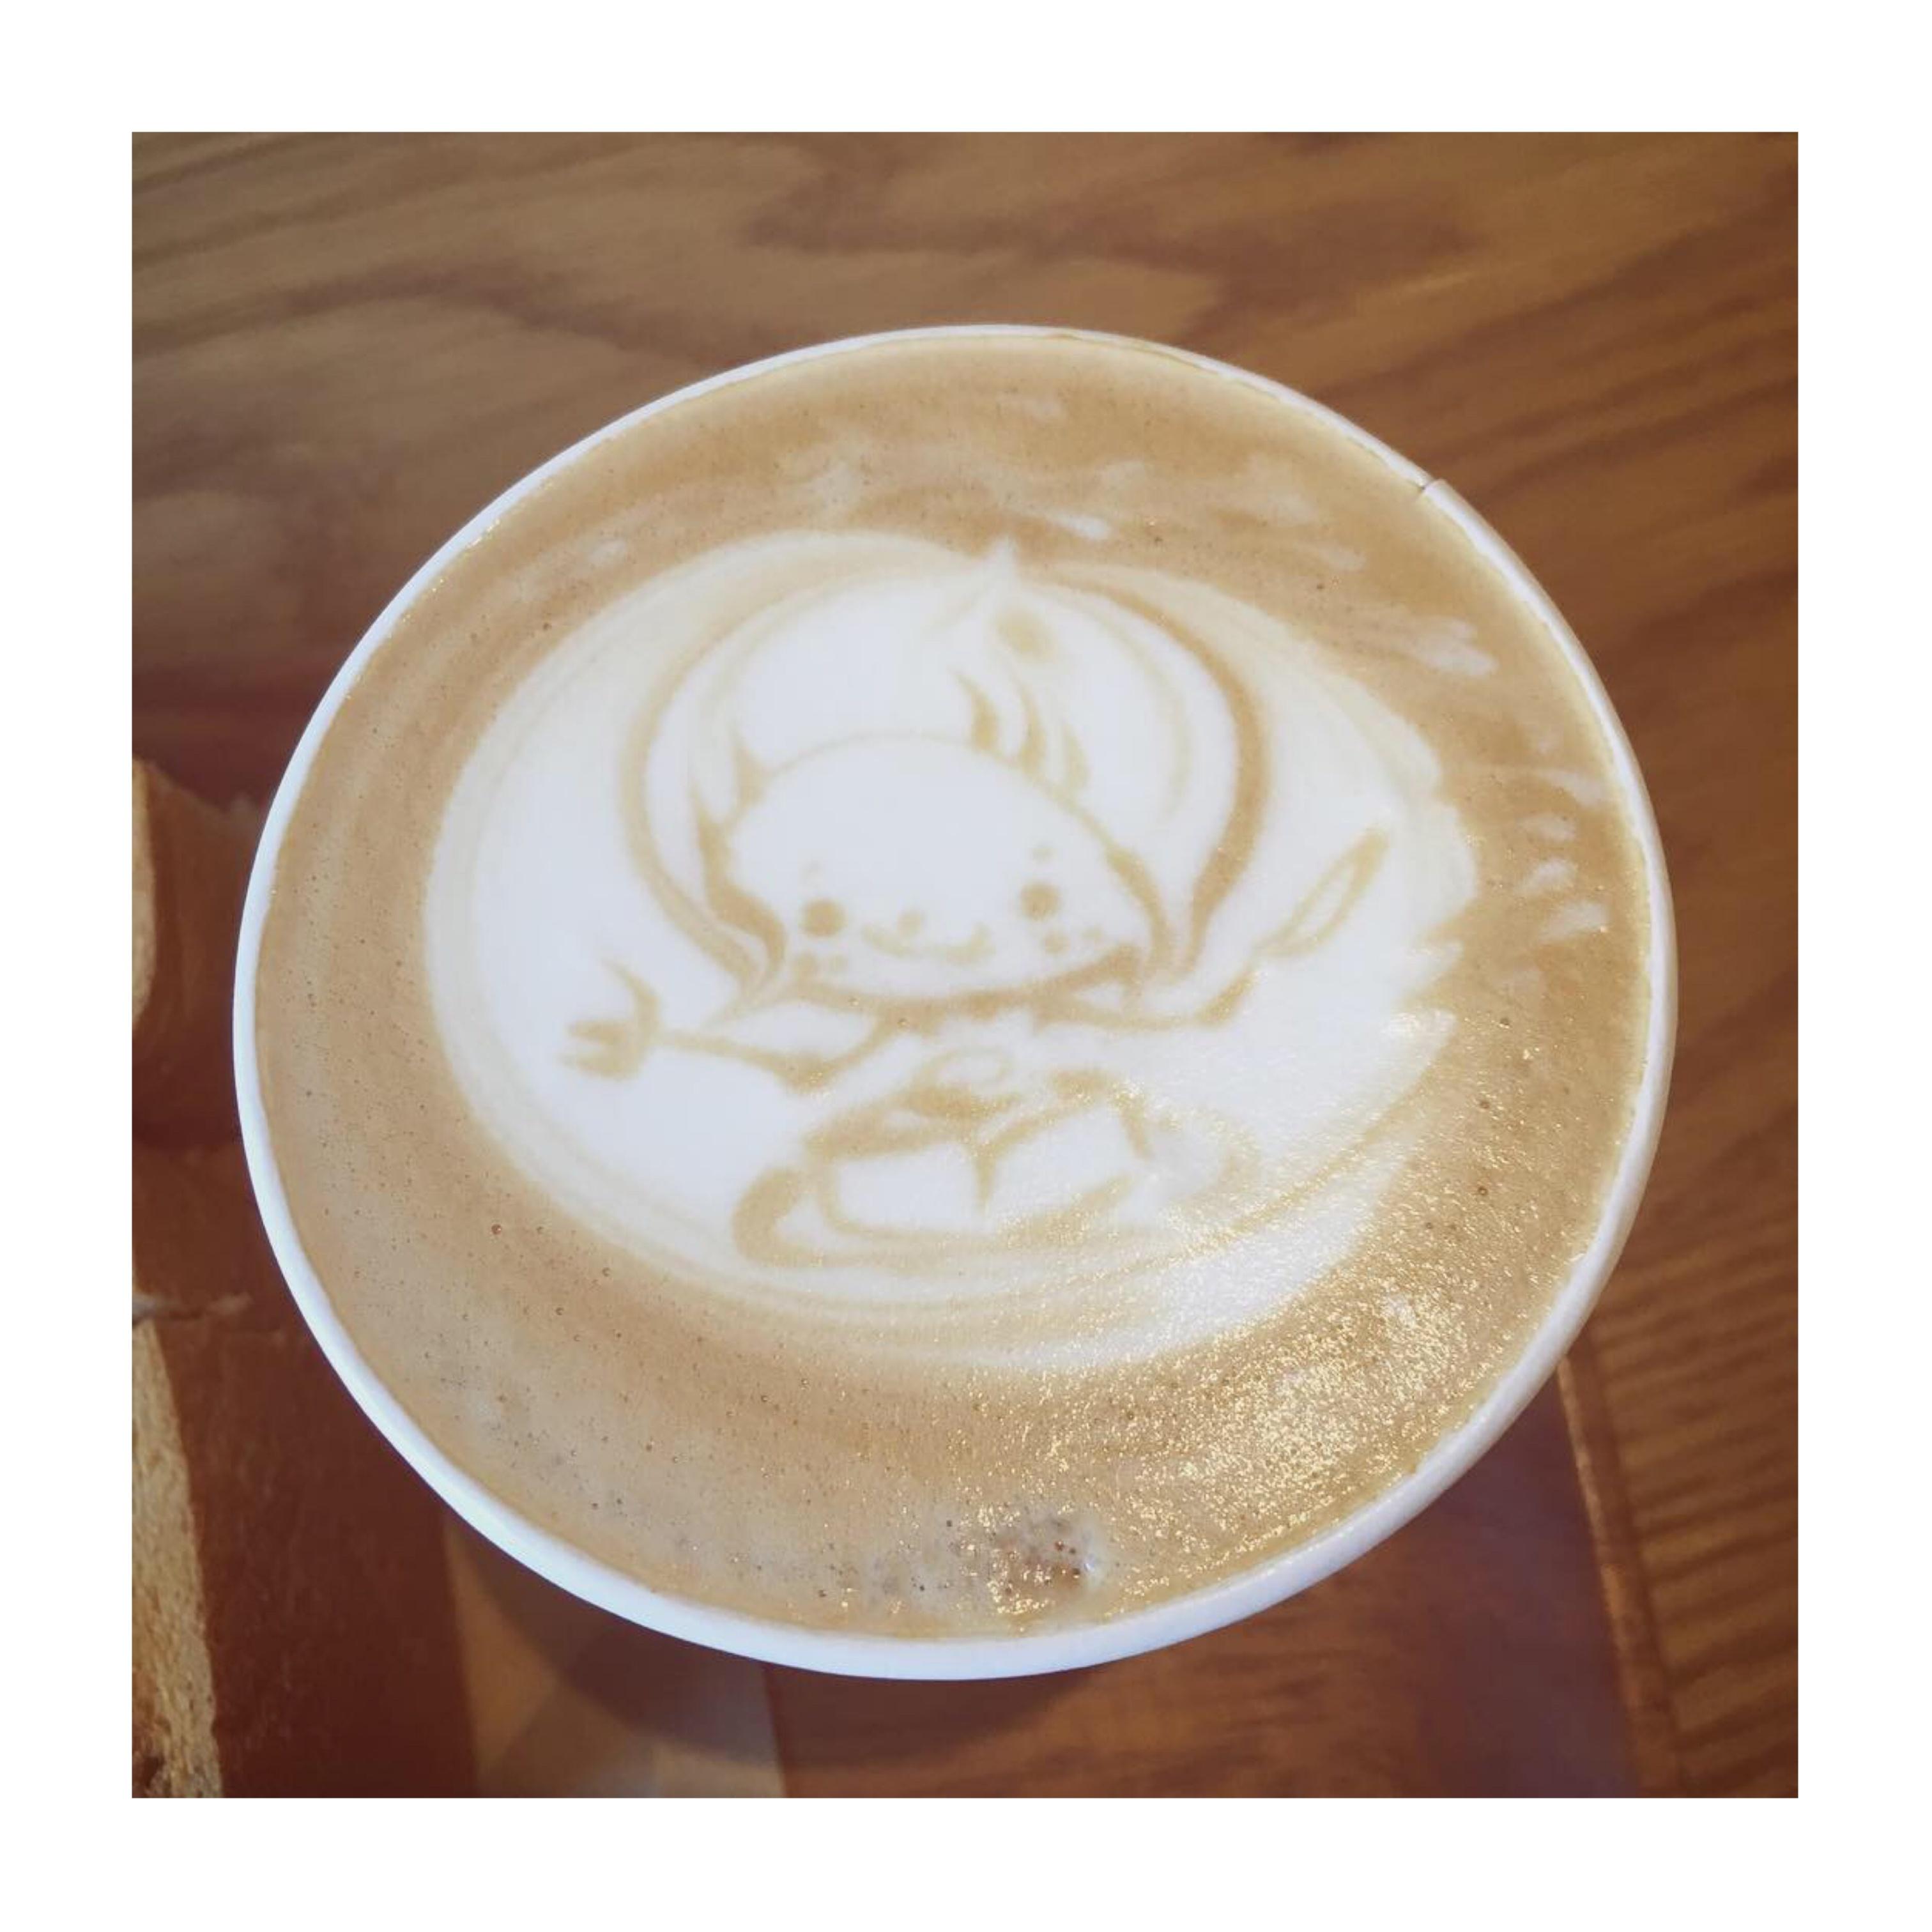 #12【#cafestagram】❤️:《東京•水道橋》ふわふわ絶品!厚切りトーストと可愛いラテアートが人気のカフェ「DIXANS」☻_4